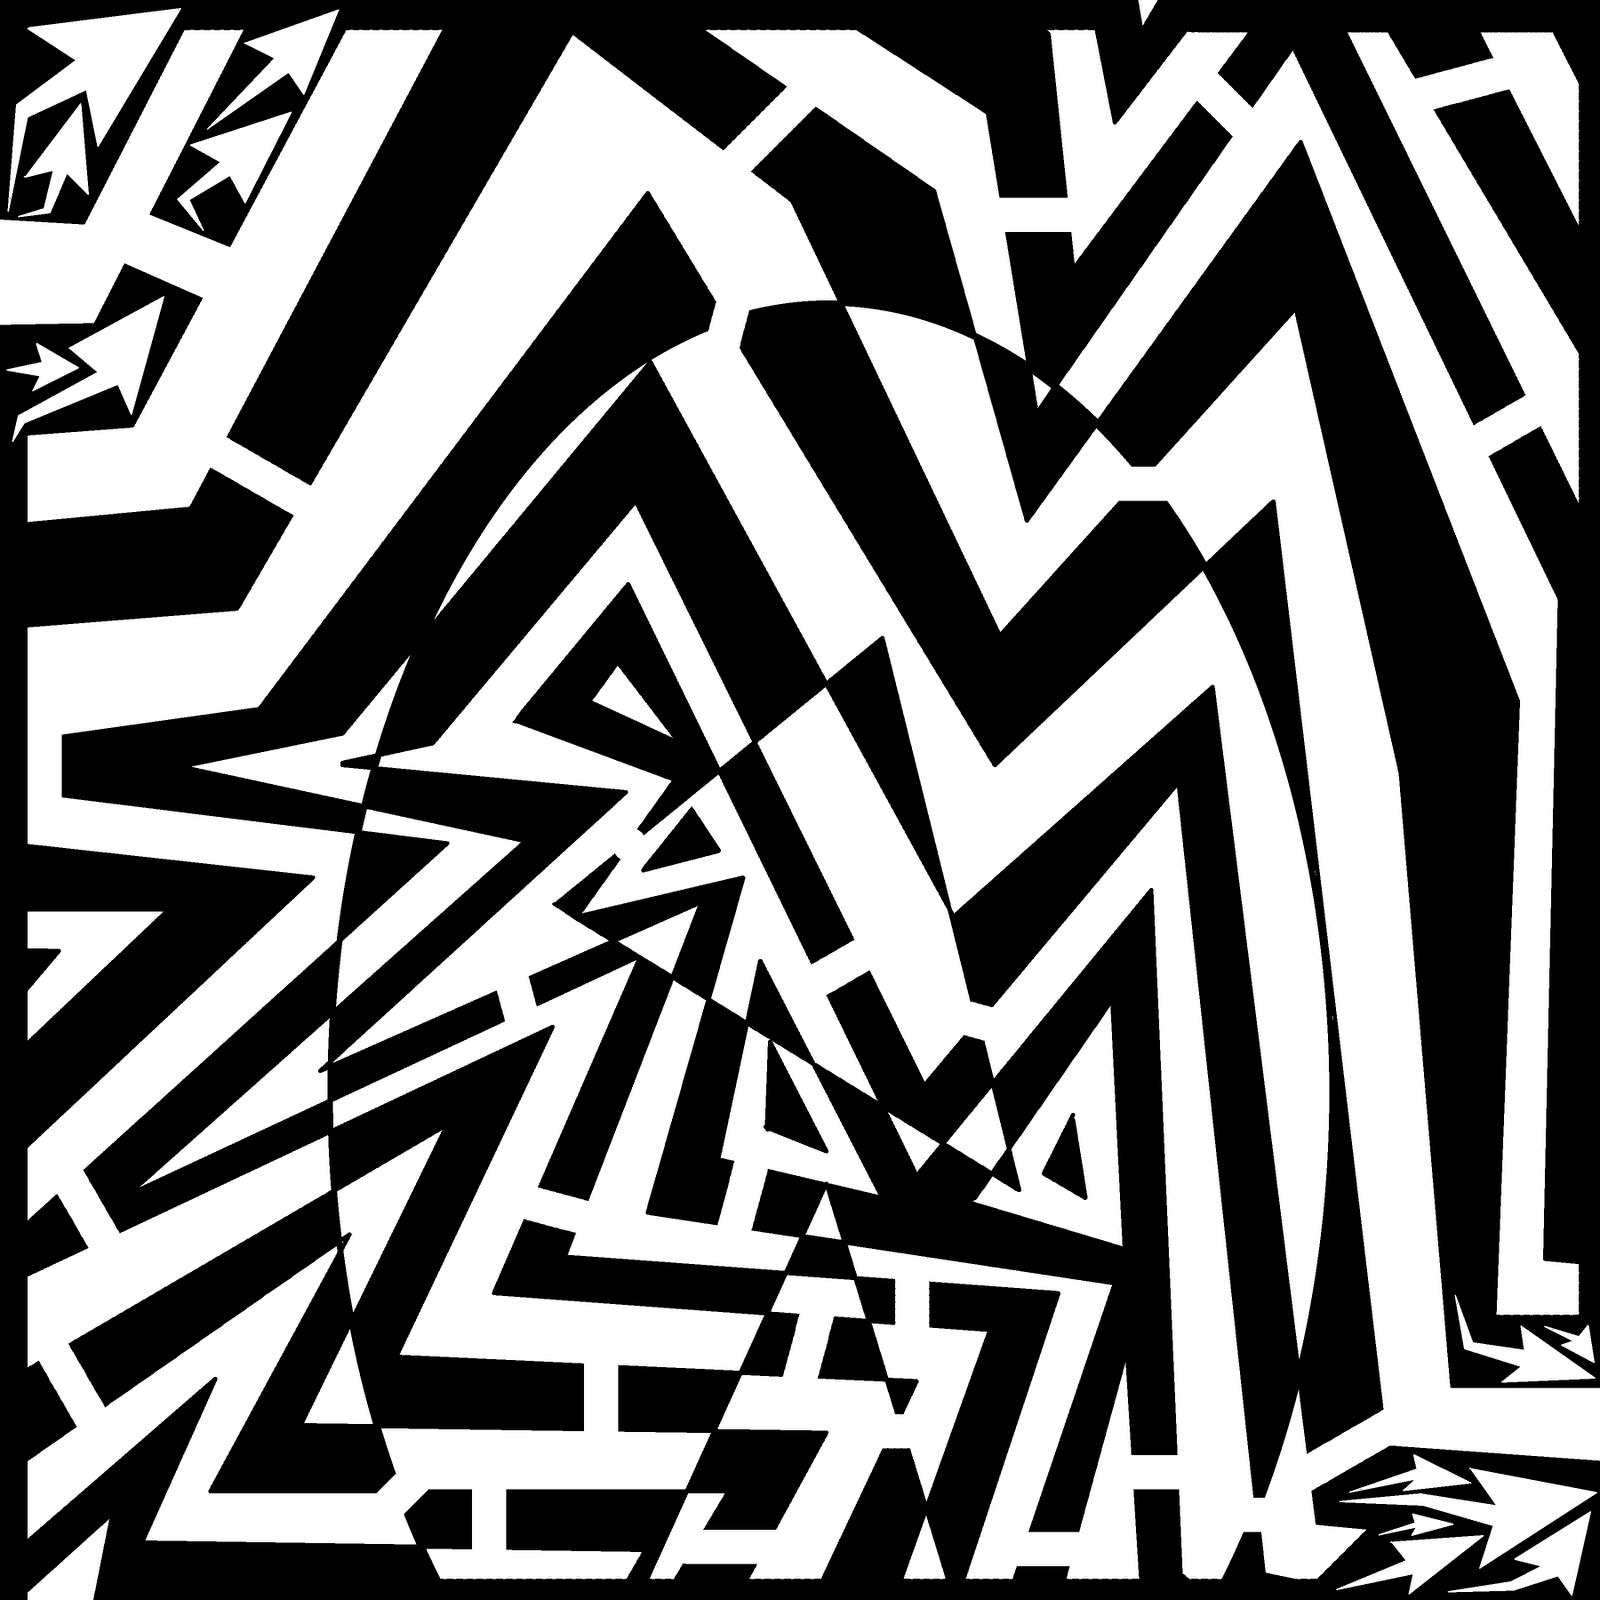 maze egg energetic illusion optical yonatan frimer artist drawing oval